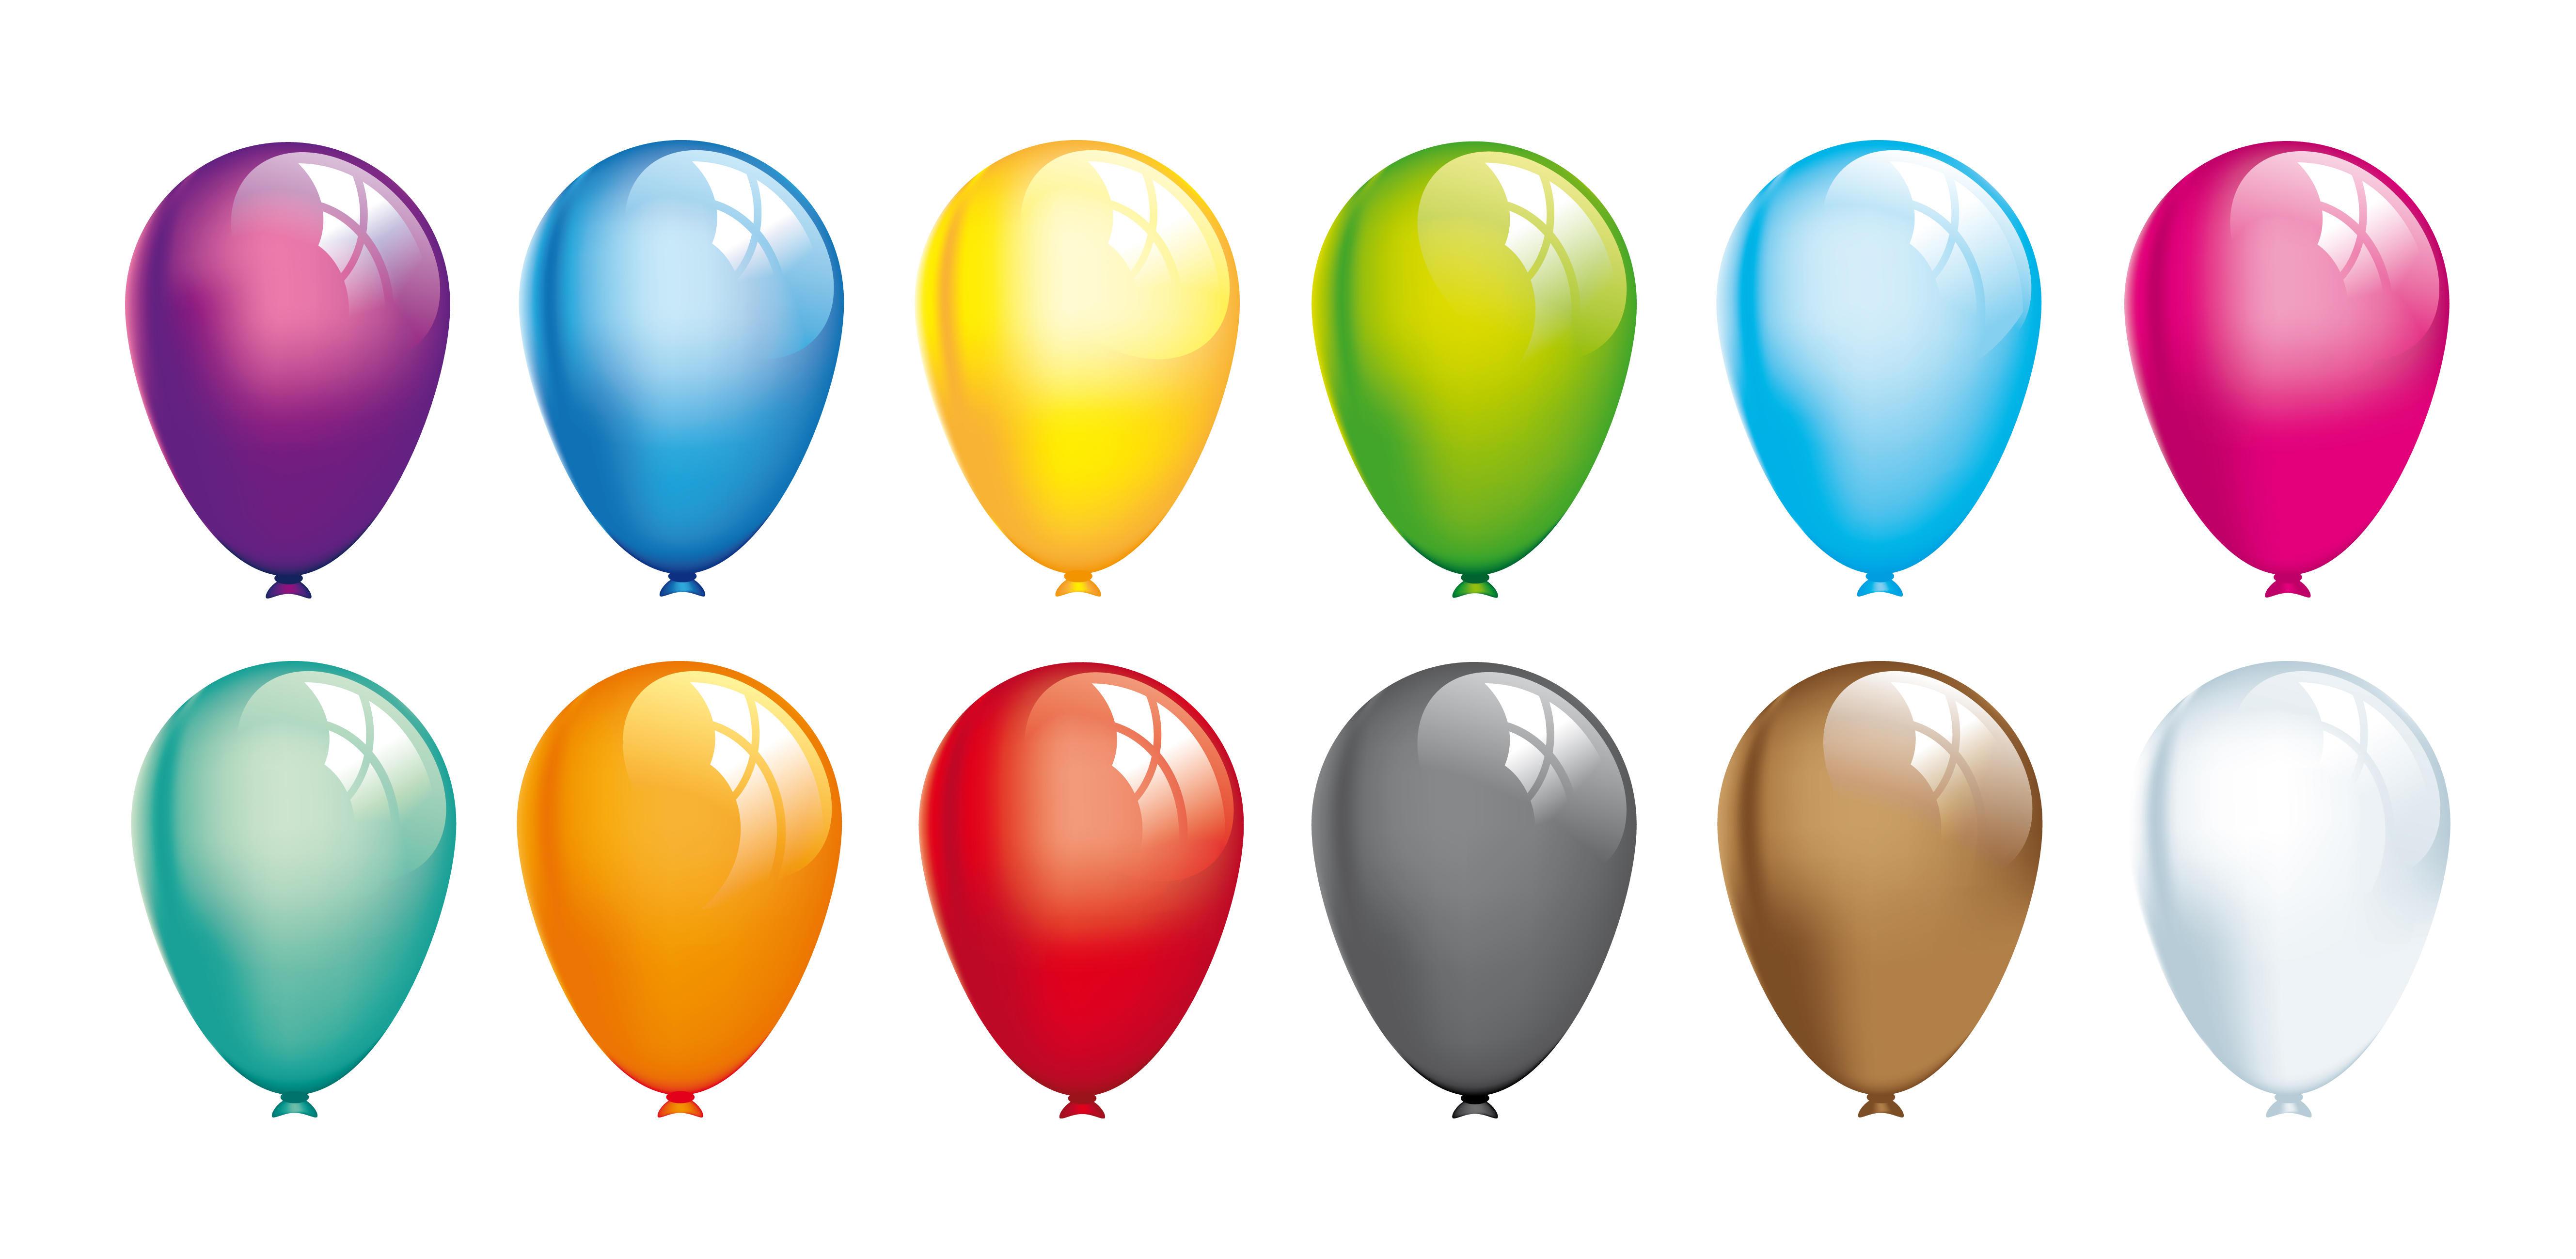 new years balloons clip art - photo #35